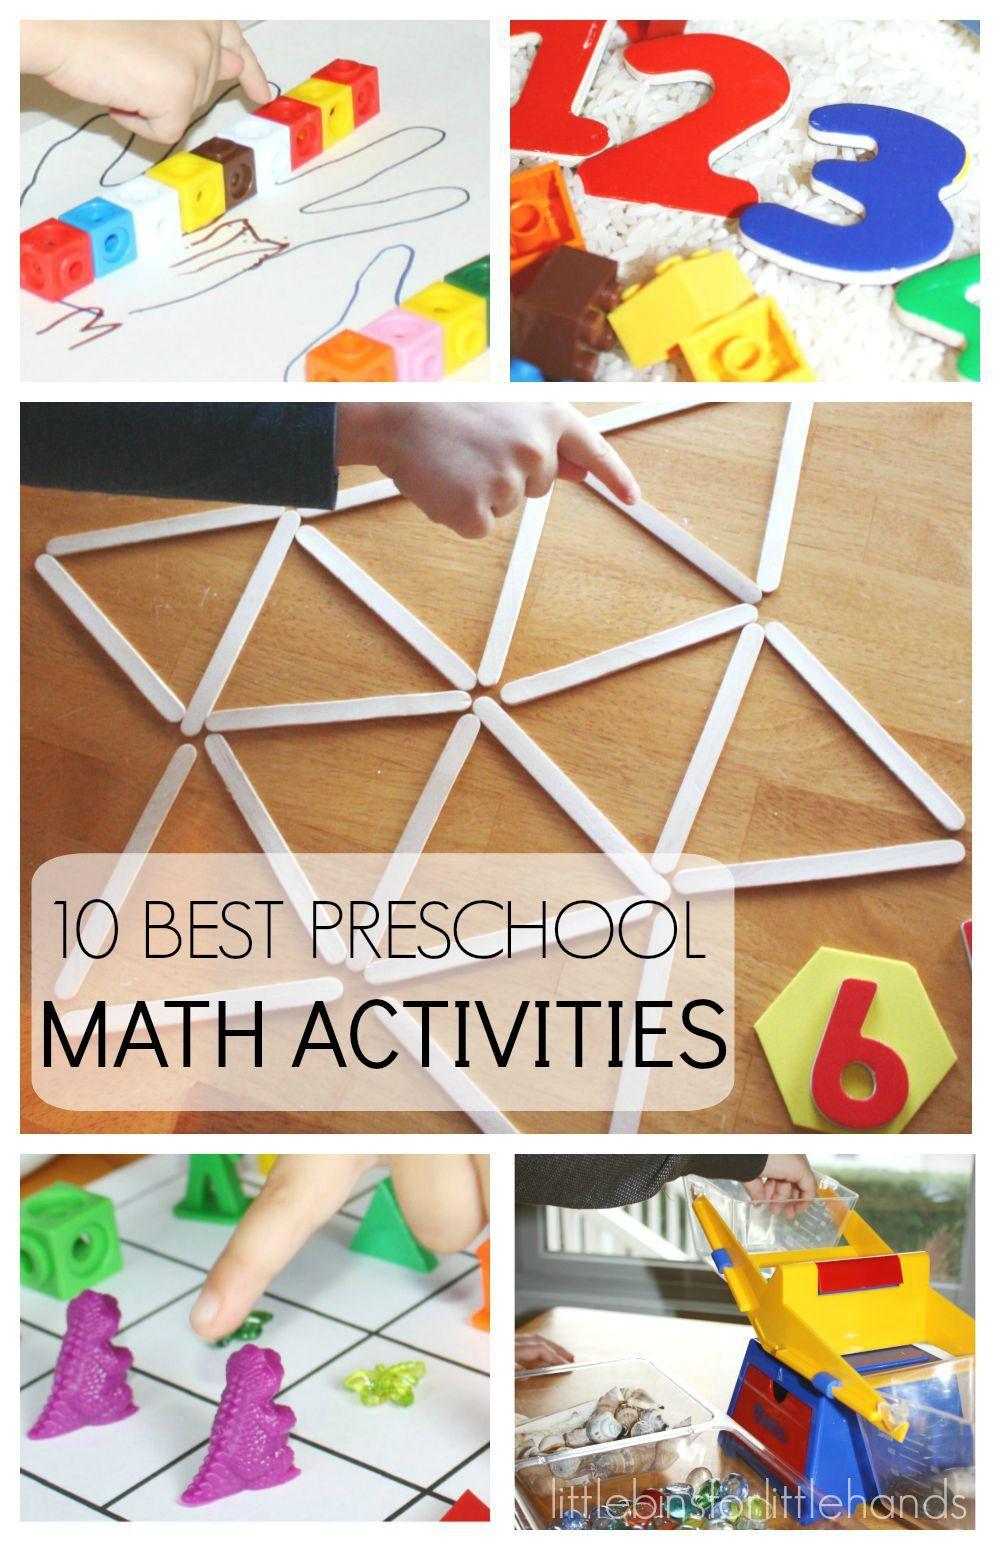 Preschool Math Activities for Back to School Early